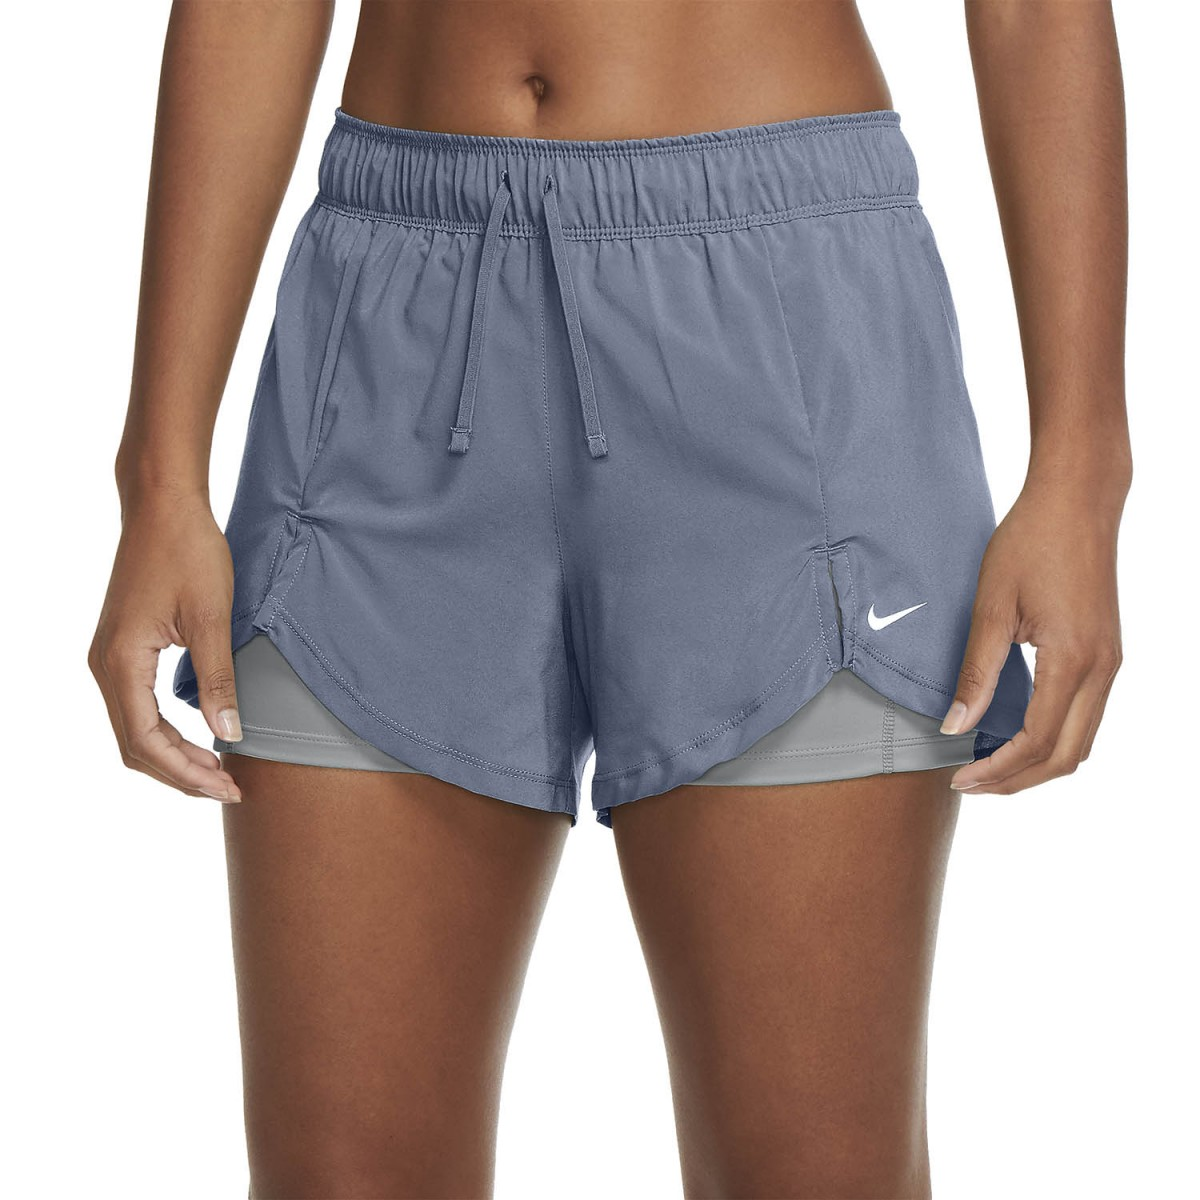 Теннисные шорты женские Nike Flex 2in1 Short ashen slate/particle grey/white